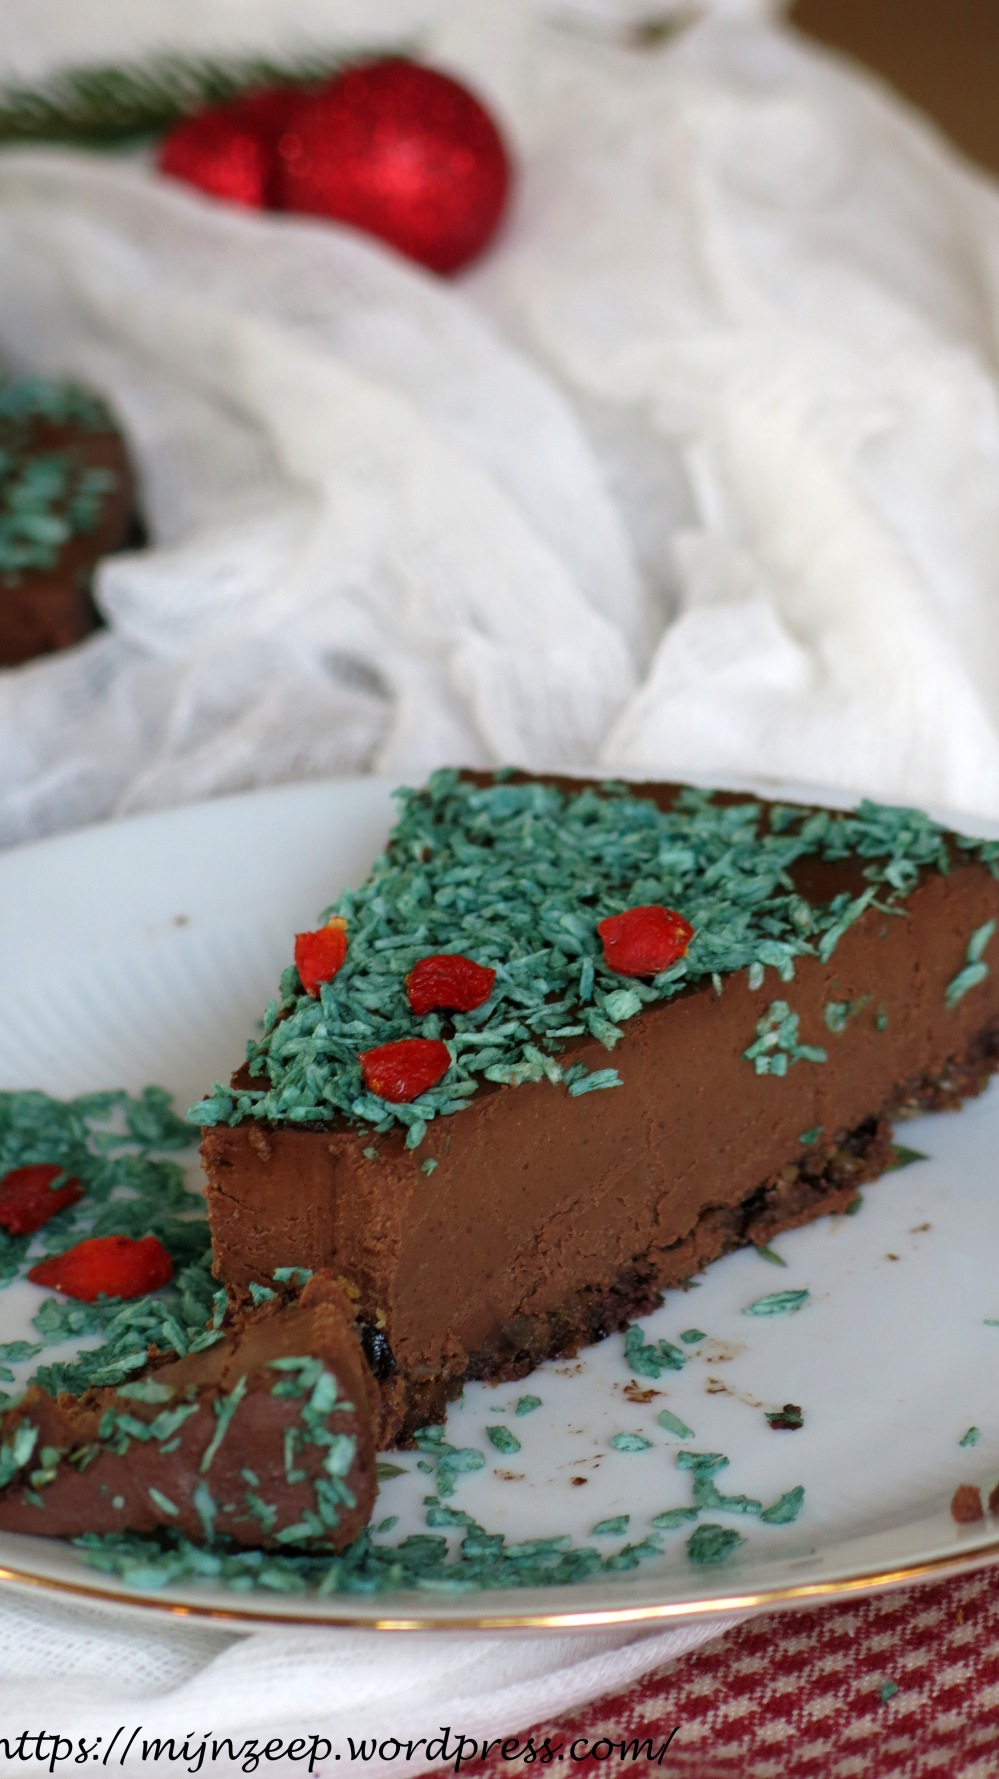 Raw Chocolate Mousse Tart